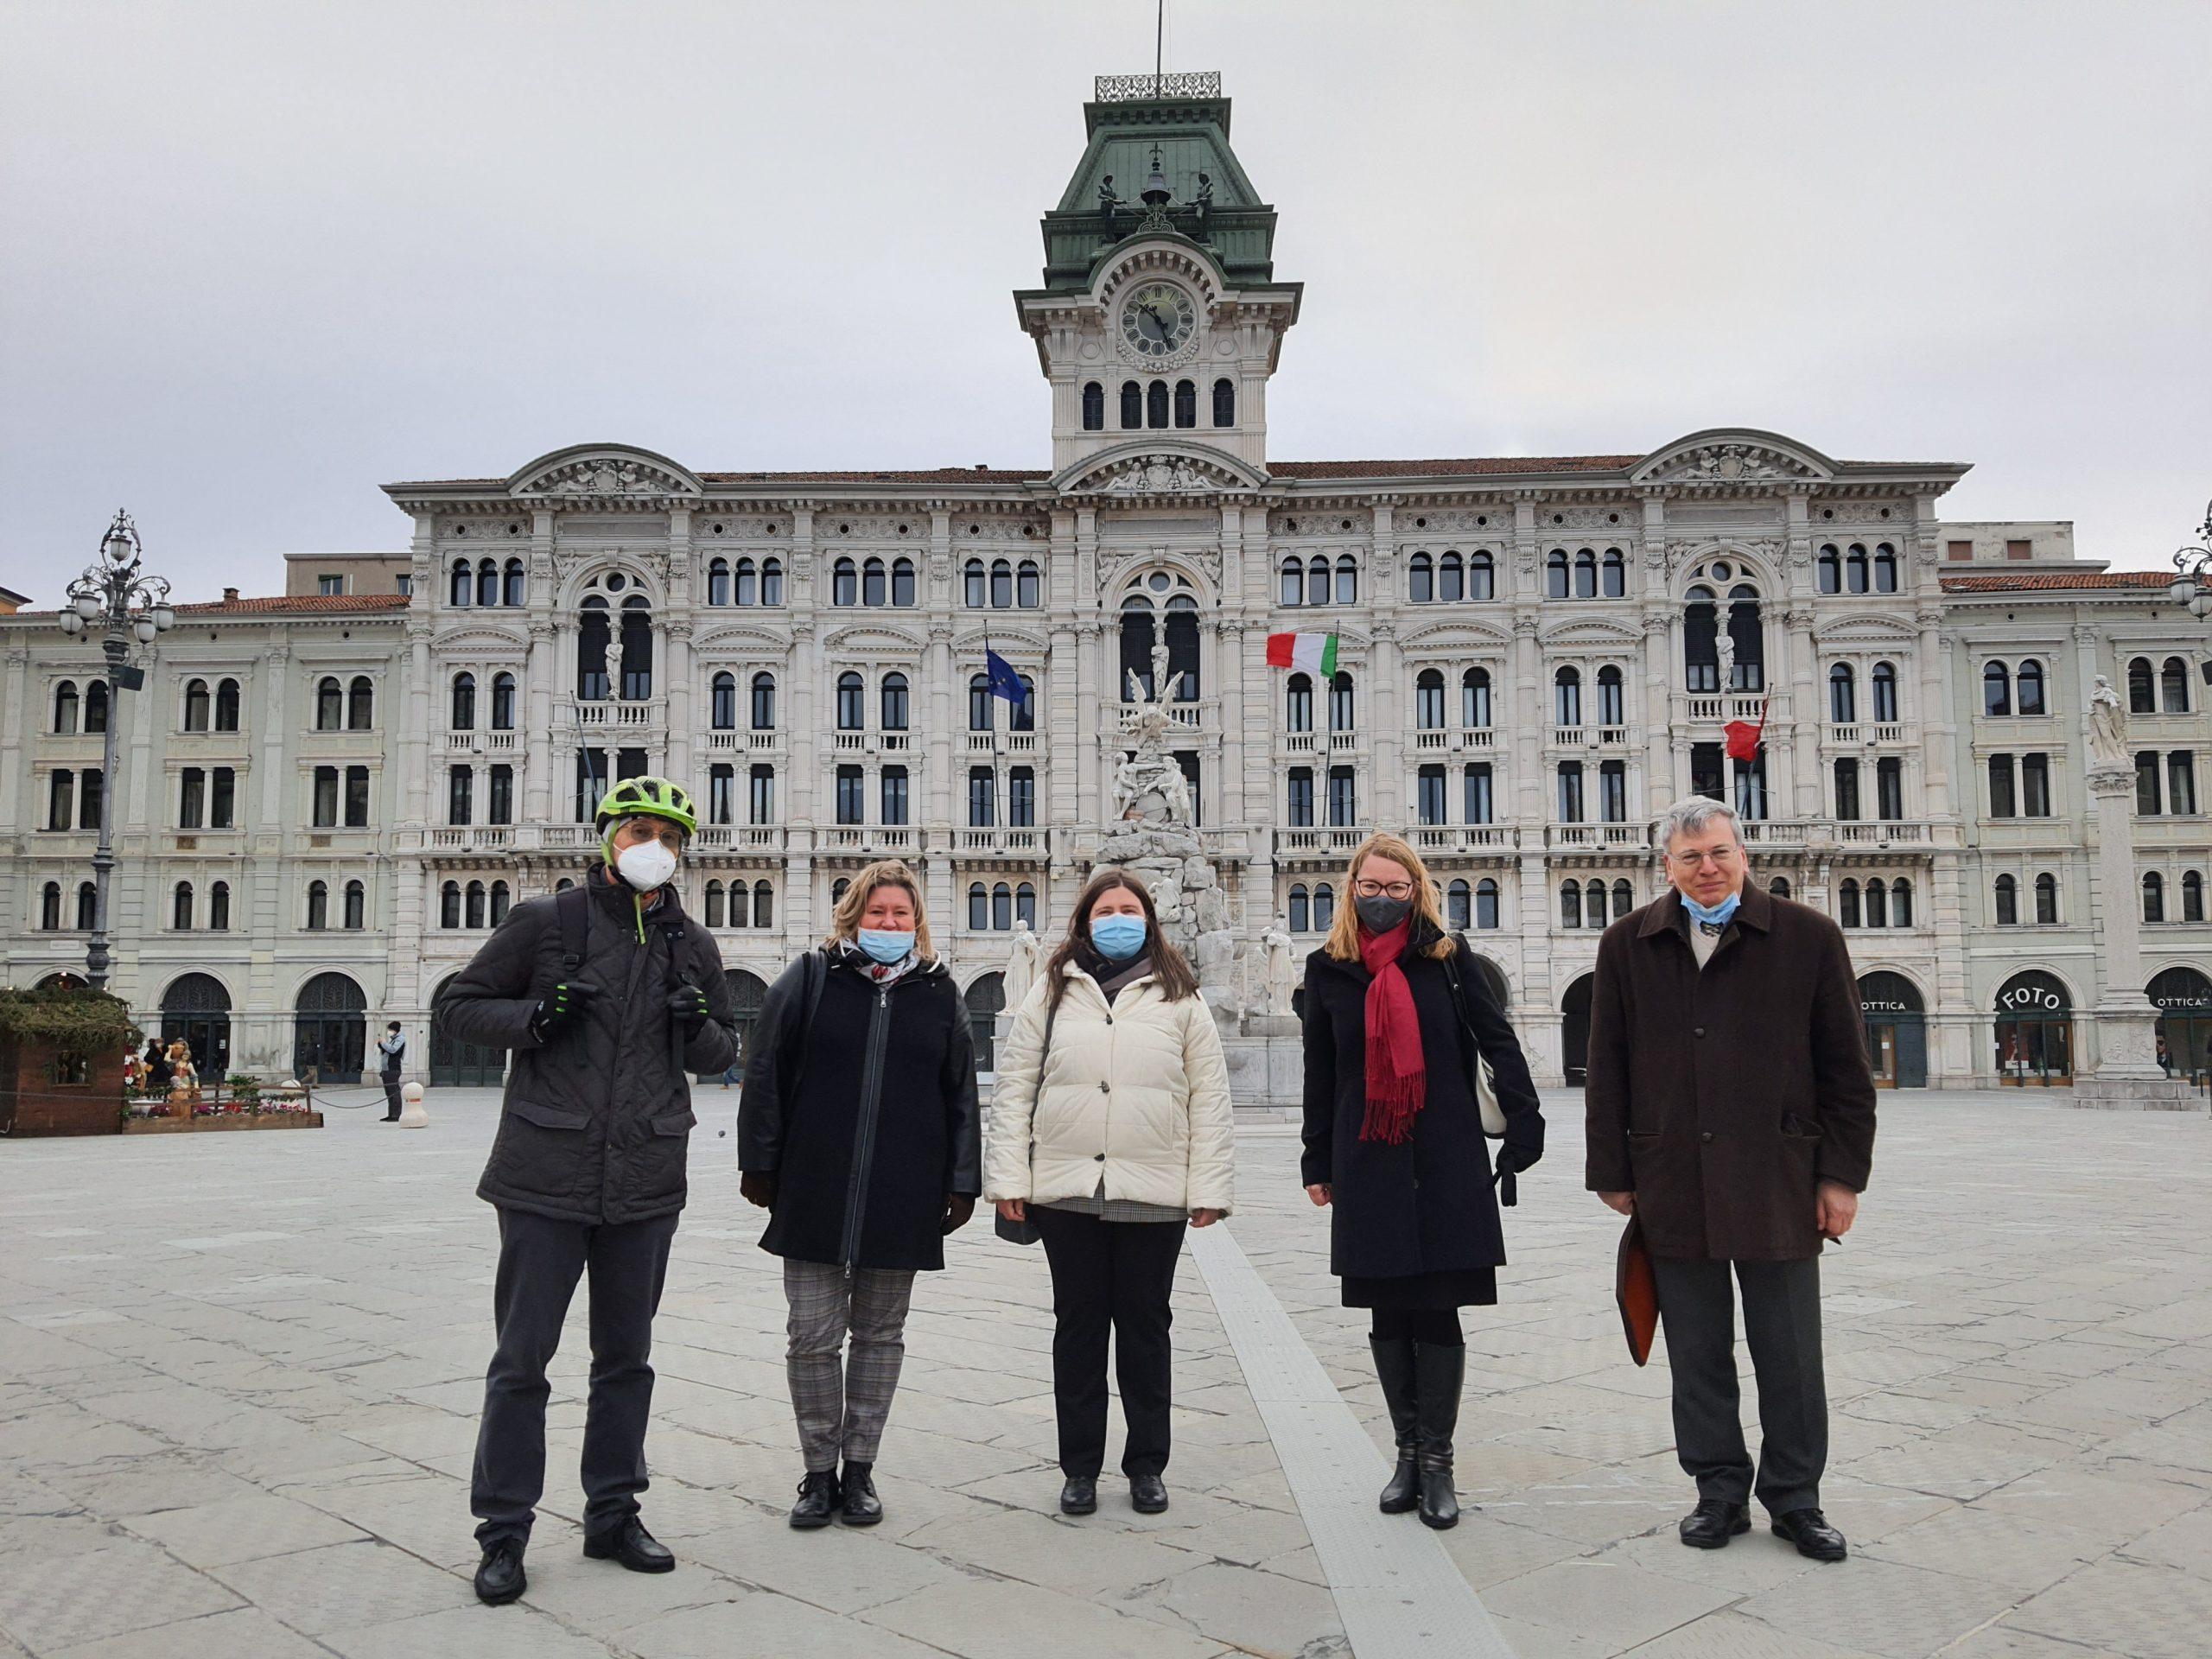 Tomaž Simčič, Erika Jazbar, nagrajenka Zulejka Devetak, ministrica dr. Helena Jaklitsch in Ivo Jevnikar (od leve proti desni).